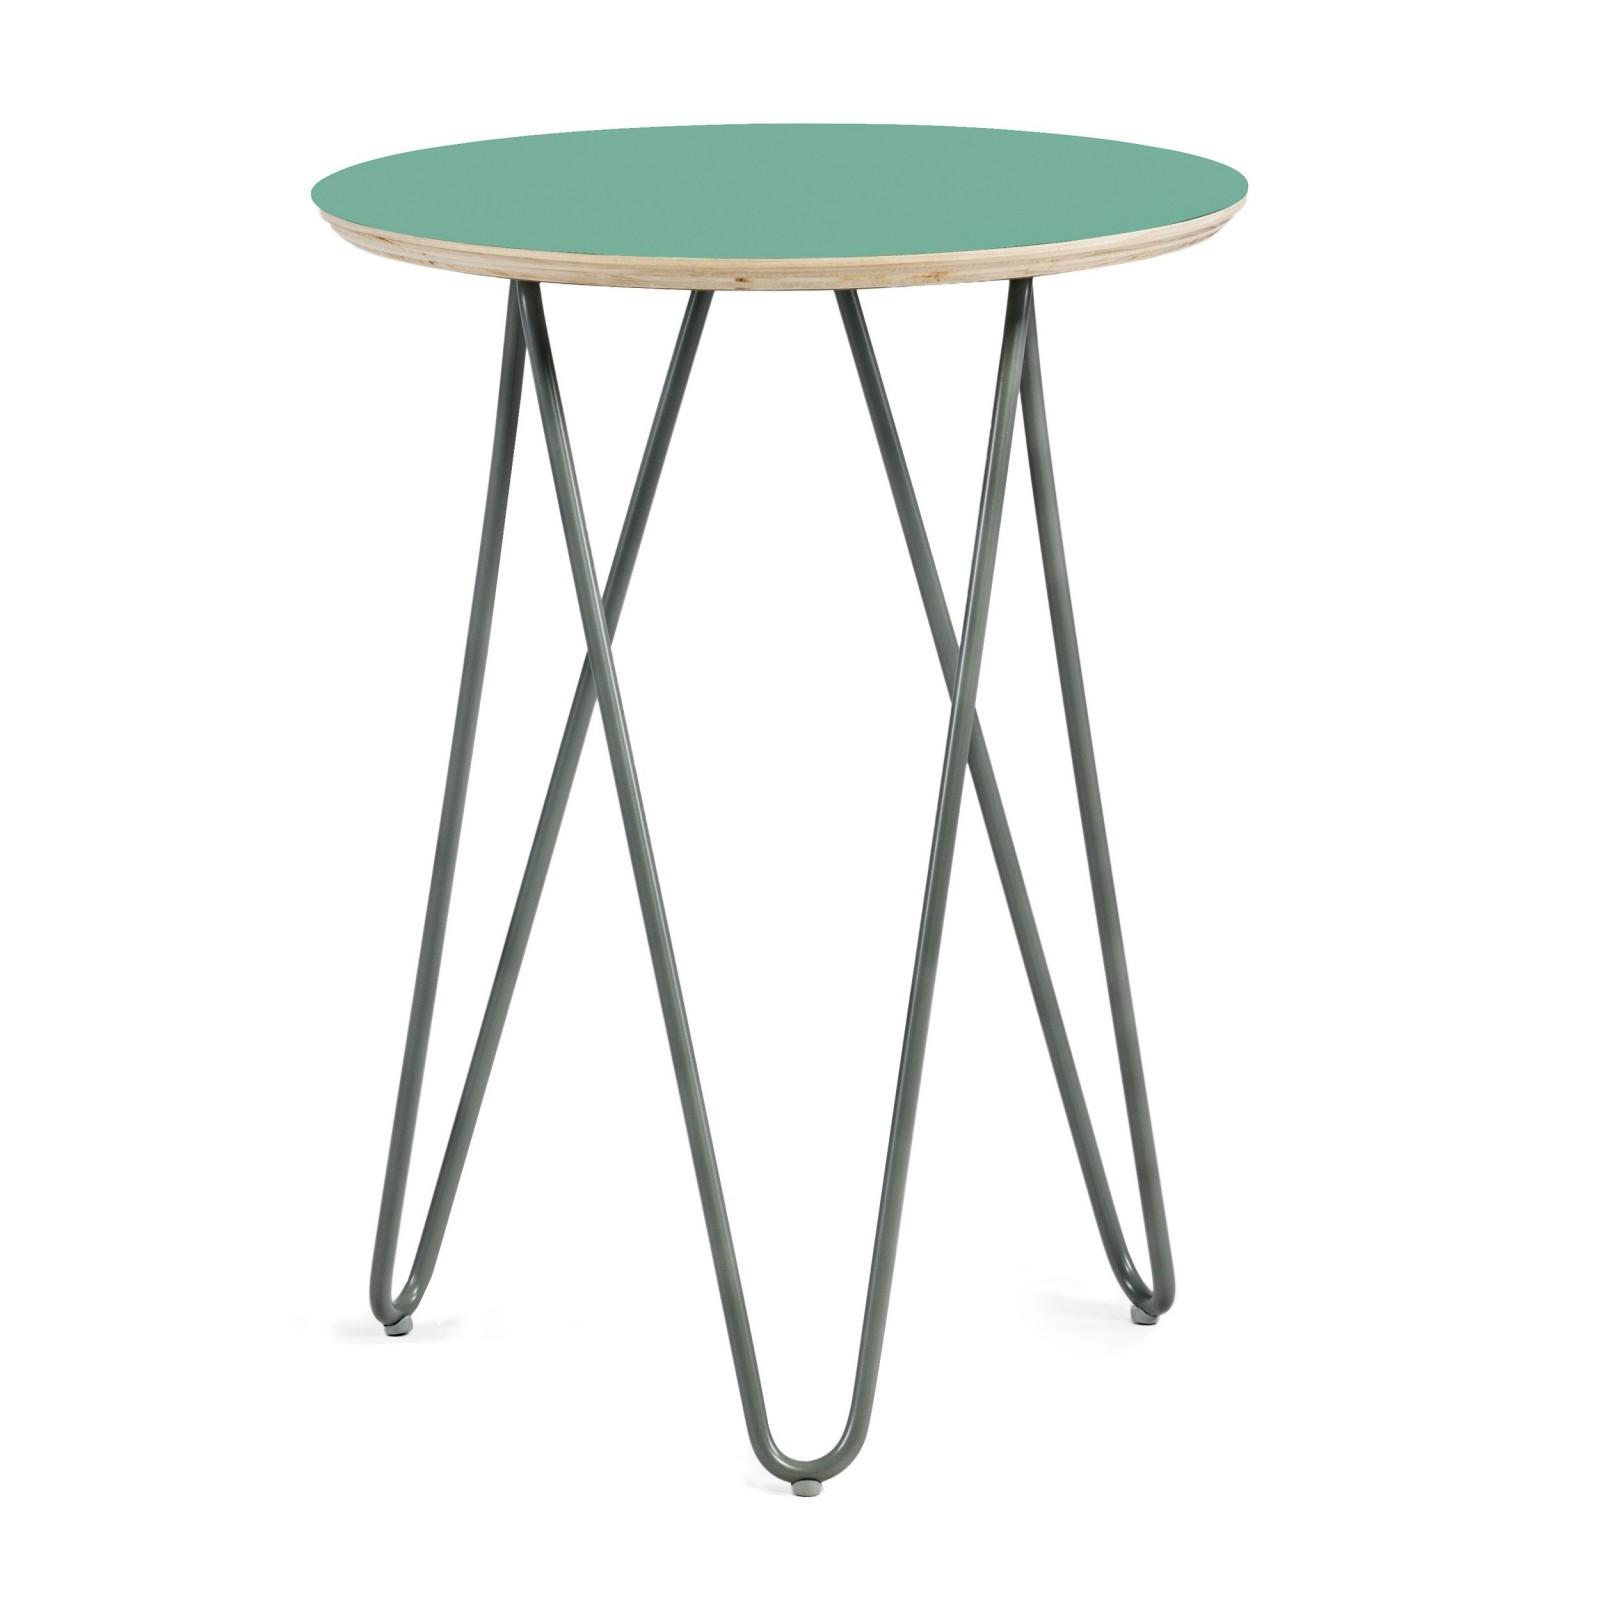 coffe table Zig-Zag R 40 - mint